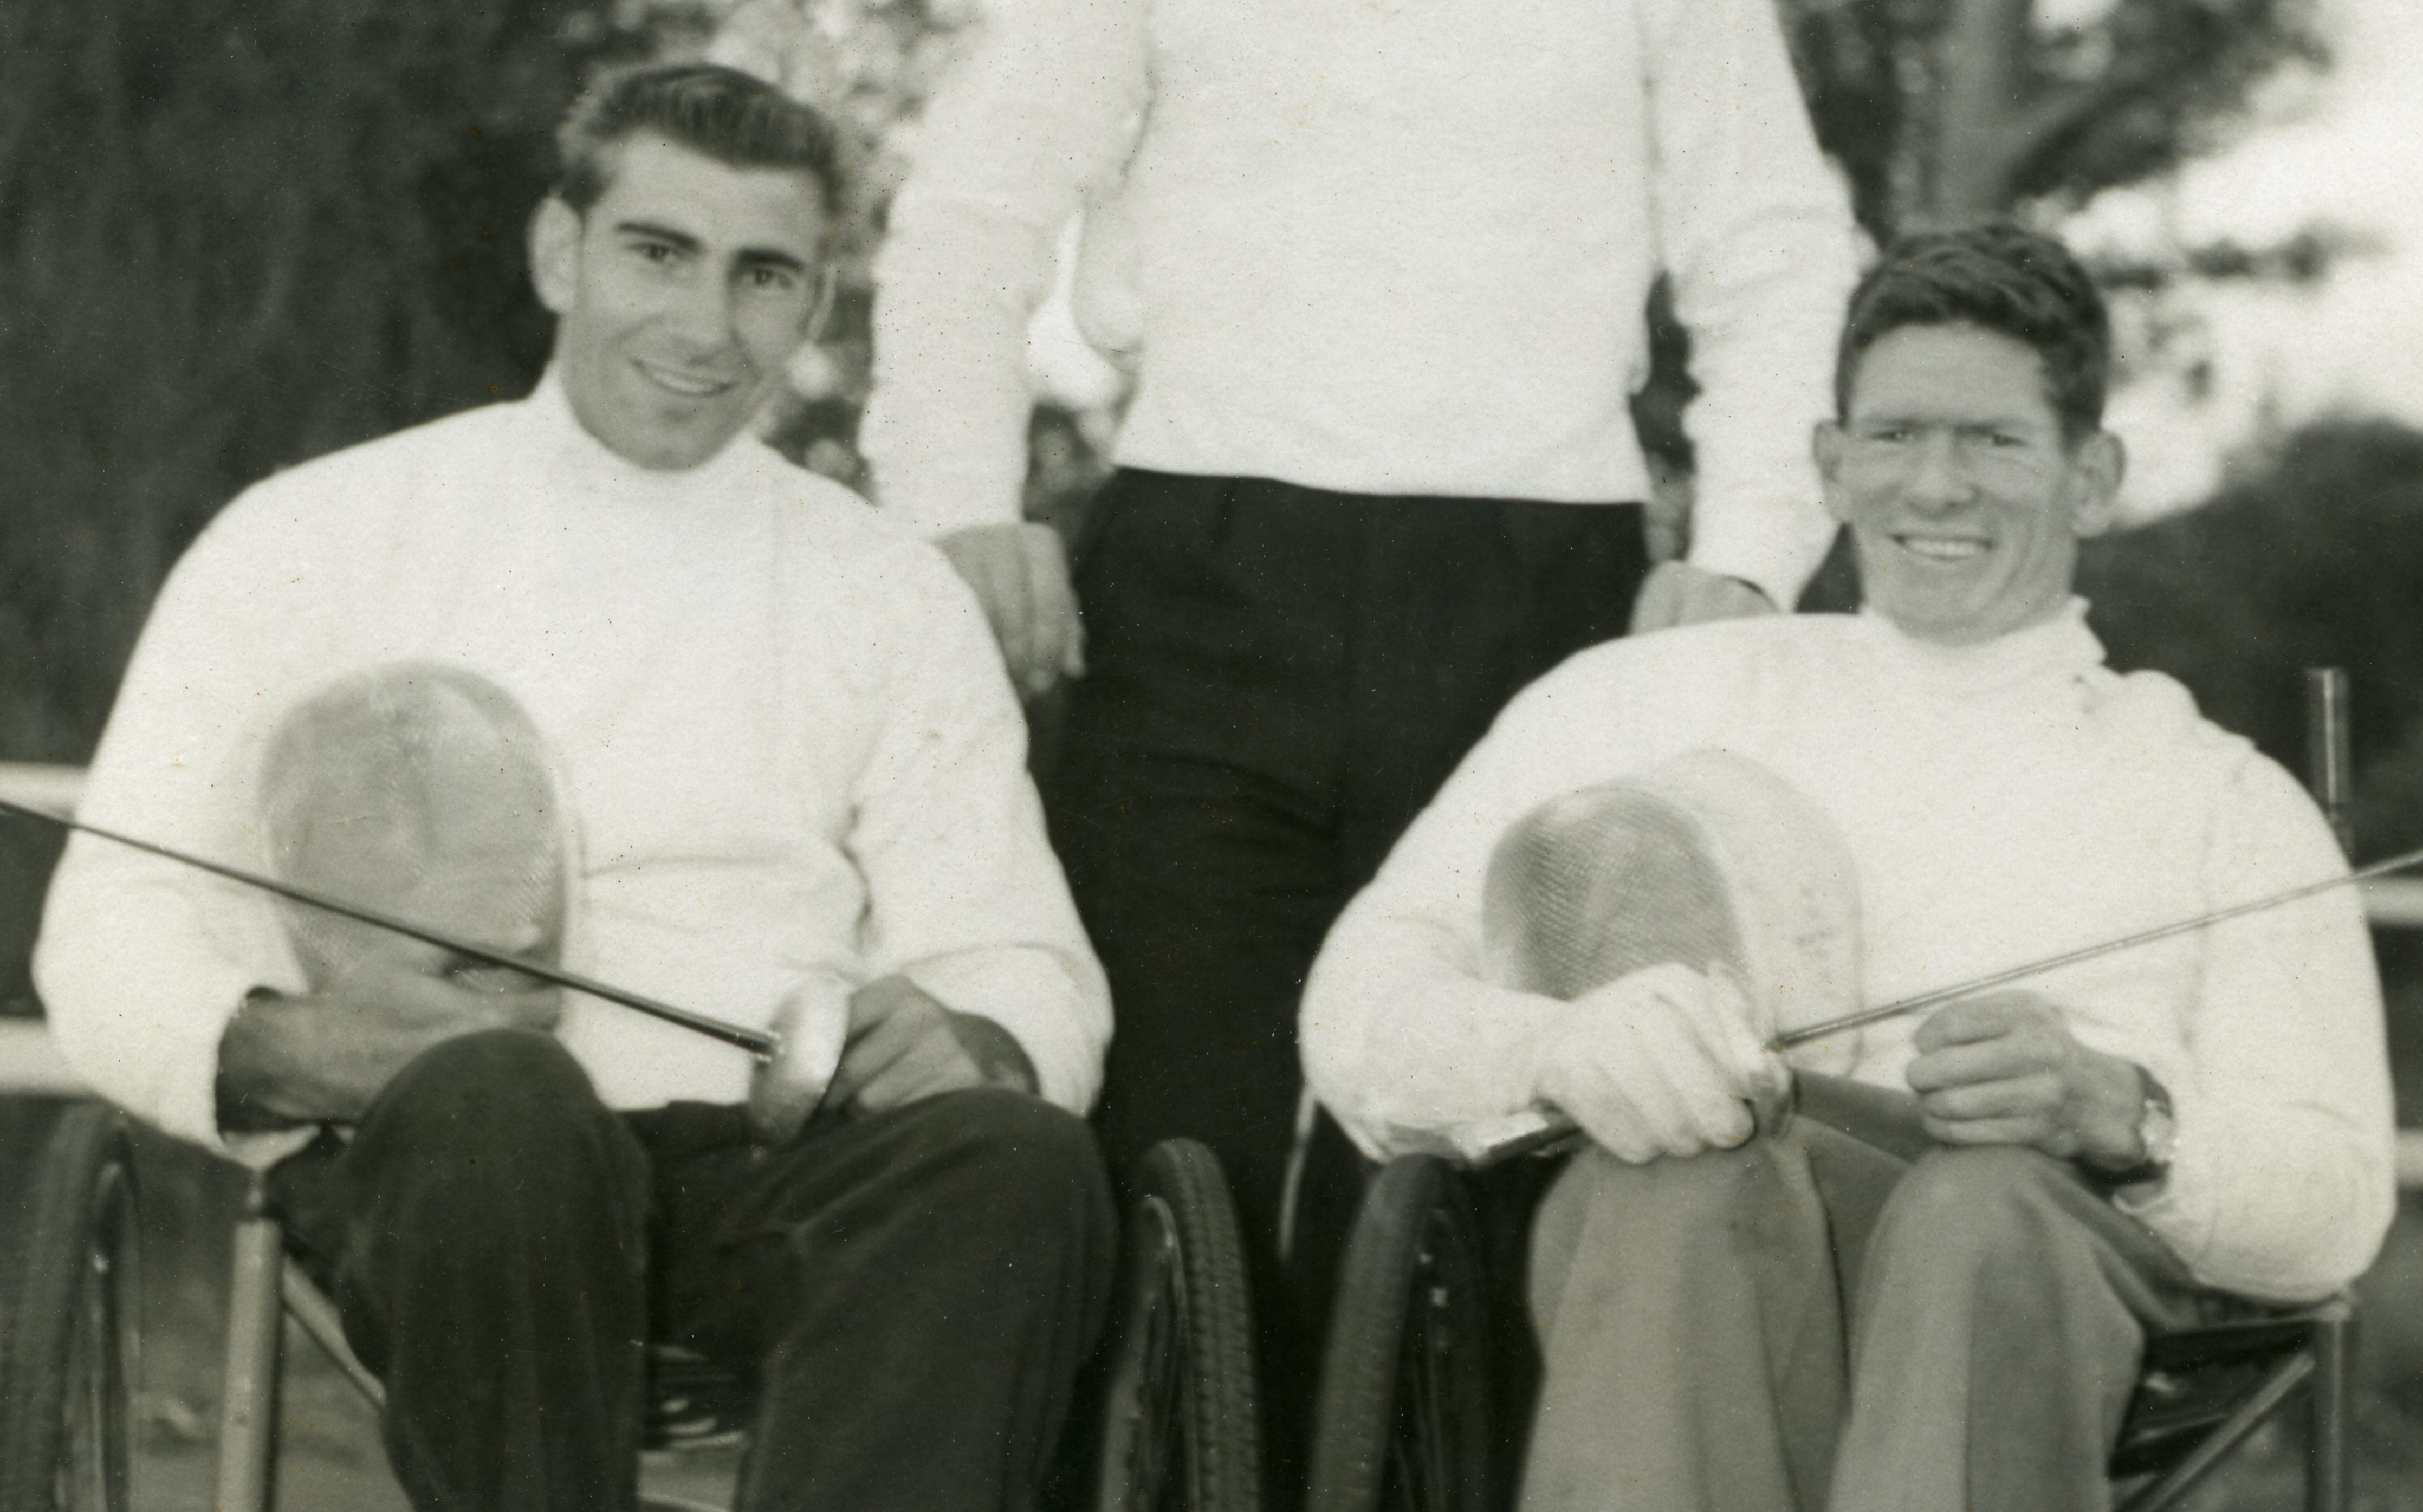 Frank Ponta